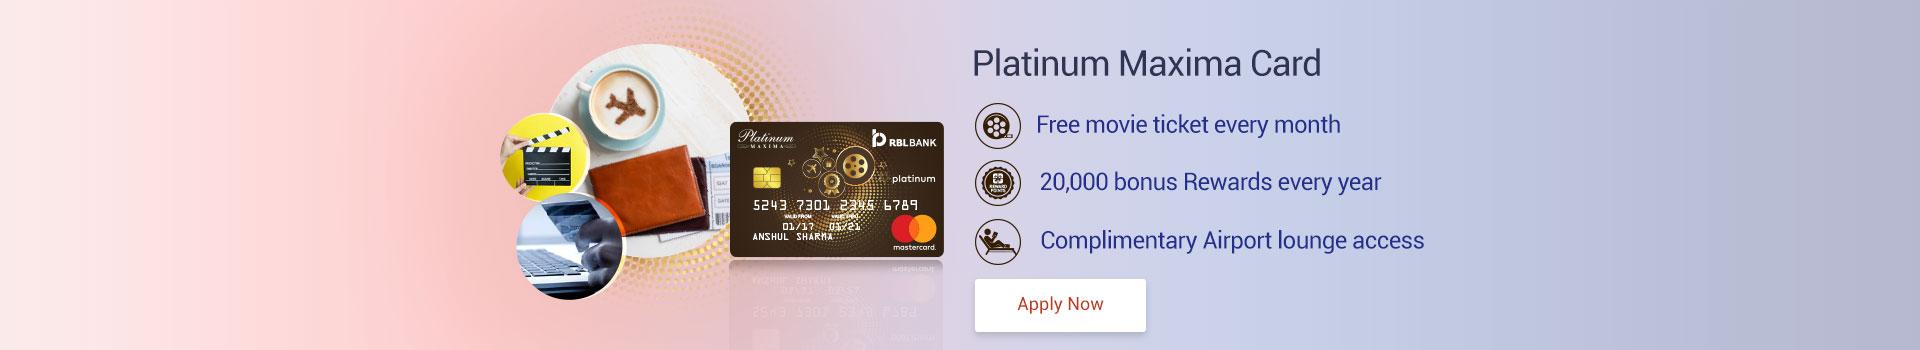 RBL Bank Platinum Maxima Credit Card Review